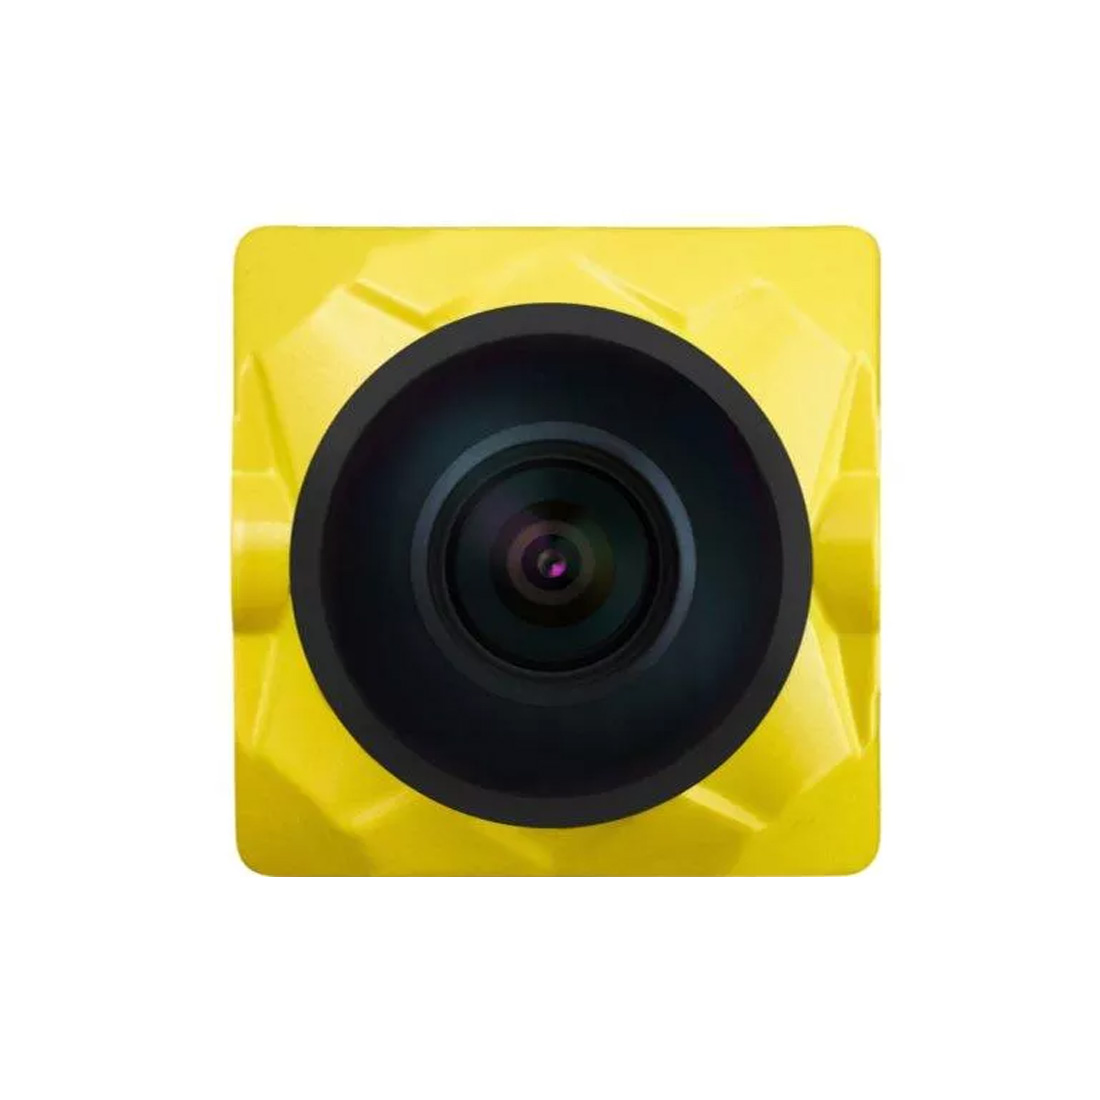 Caddx Ratel 1 1 8 Starlight HDR OSD 1200TVL NTSC PAL 16 9 4 3 Switchable